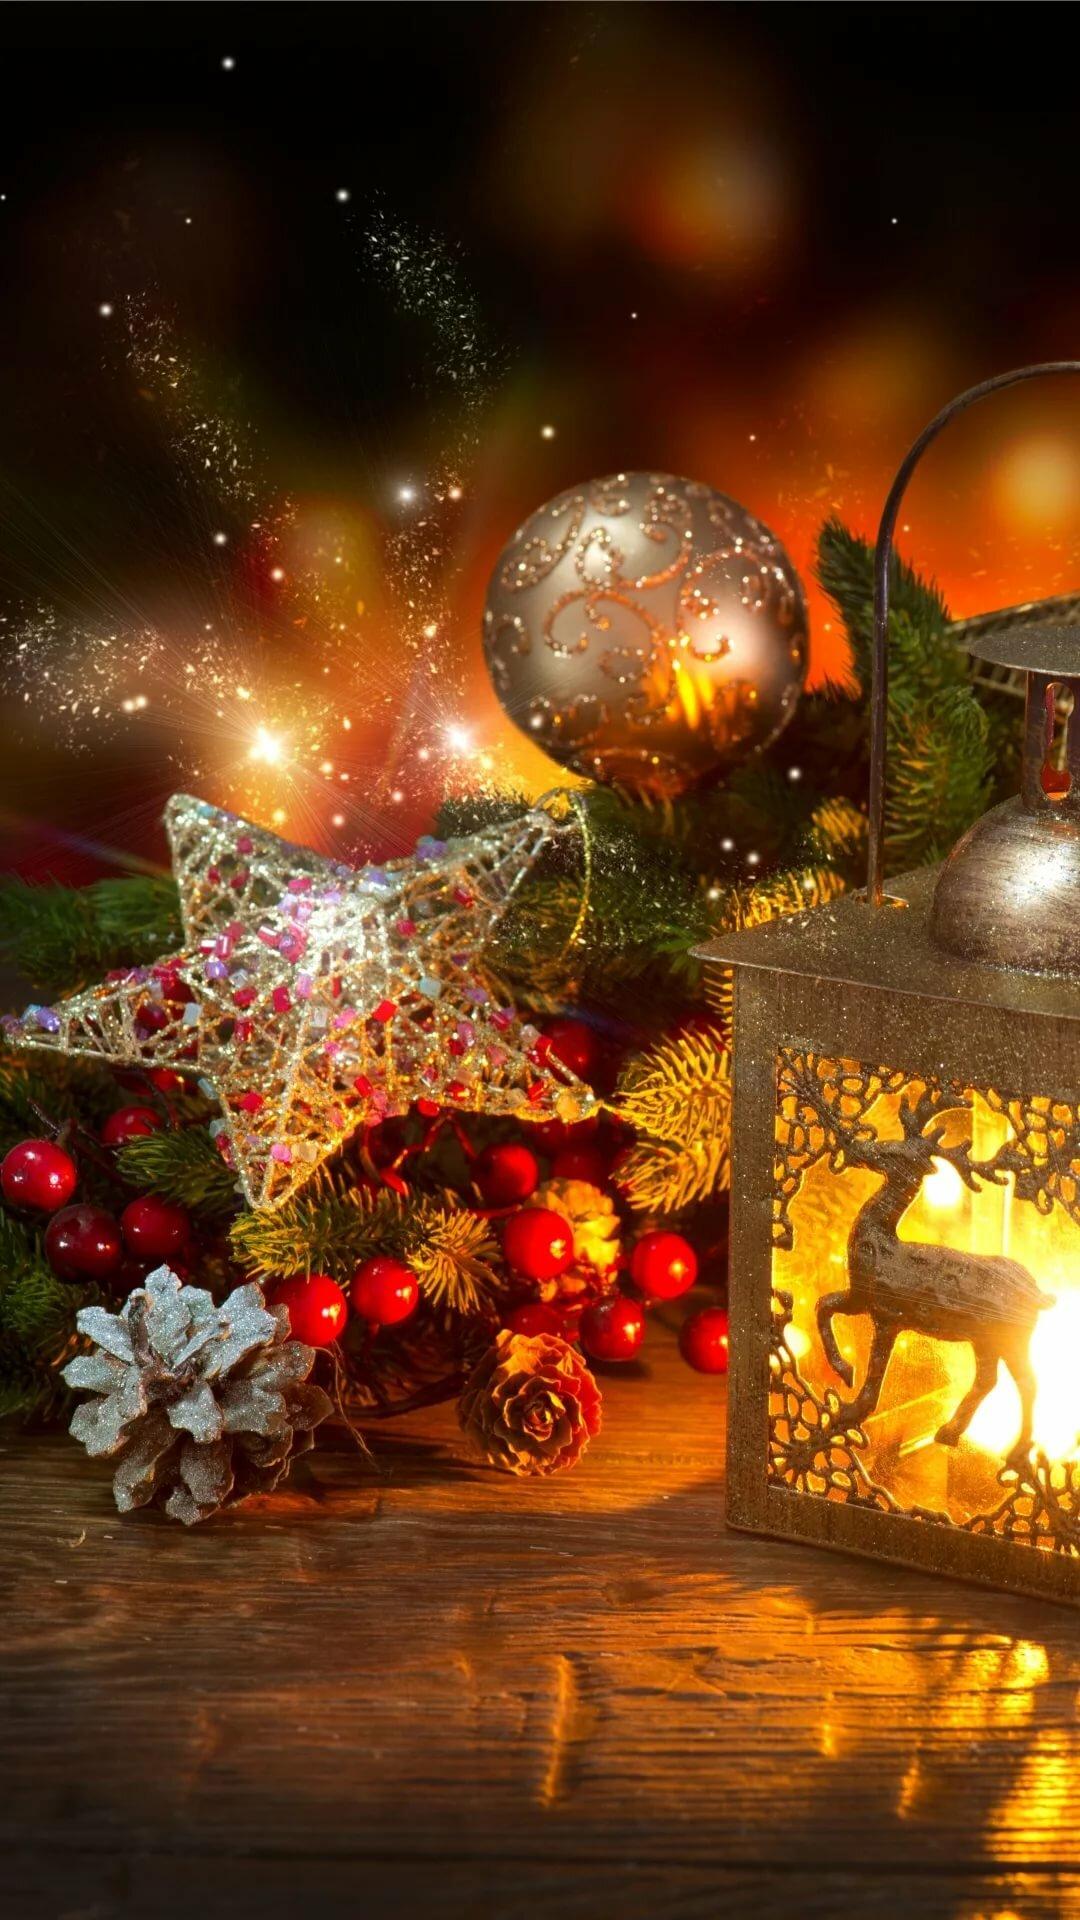 новогодний фонарик гиф вашему